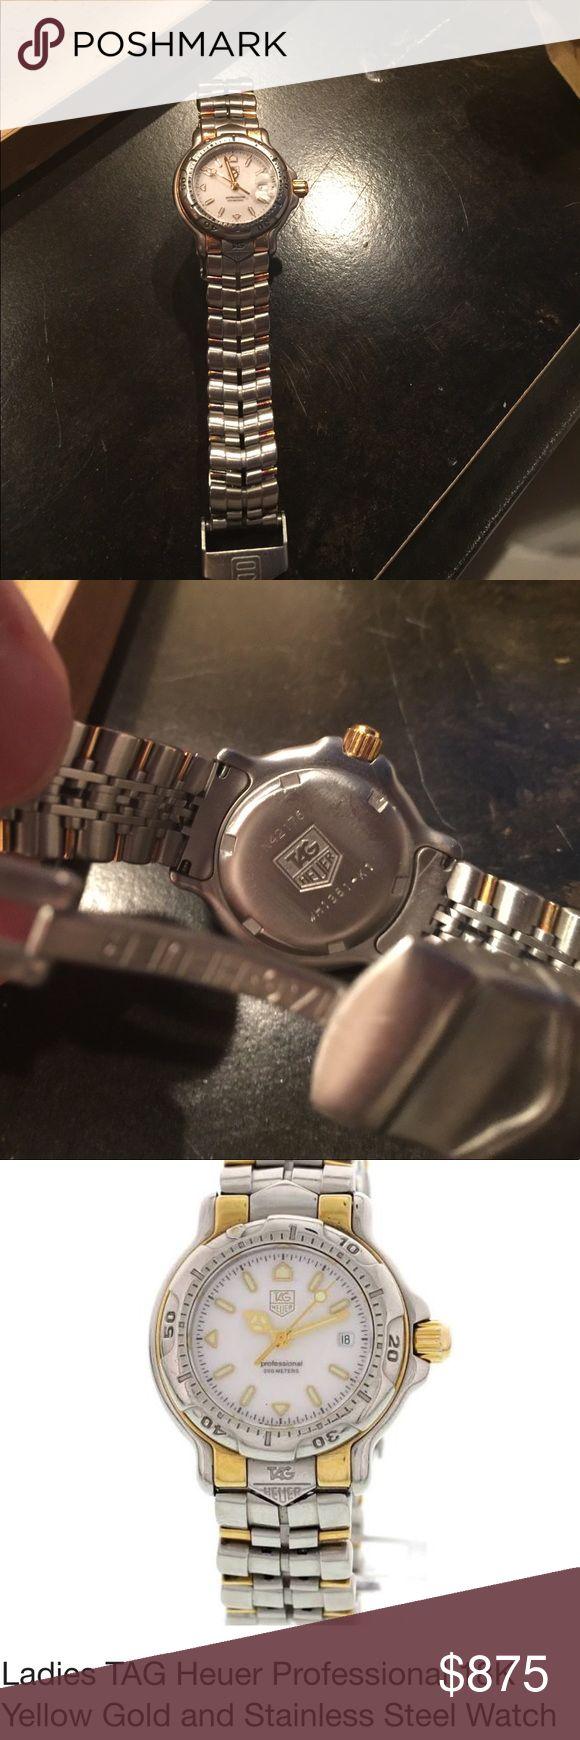 Tag Heuer Professional Ladies Watch Tag Heuer Professional Ladies Watch Tag Heuer Accessories Watches